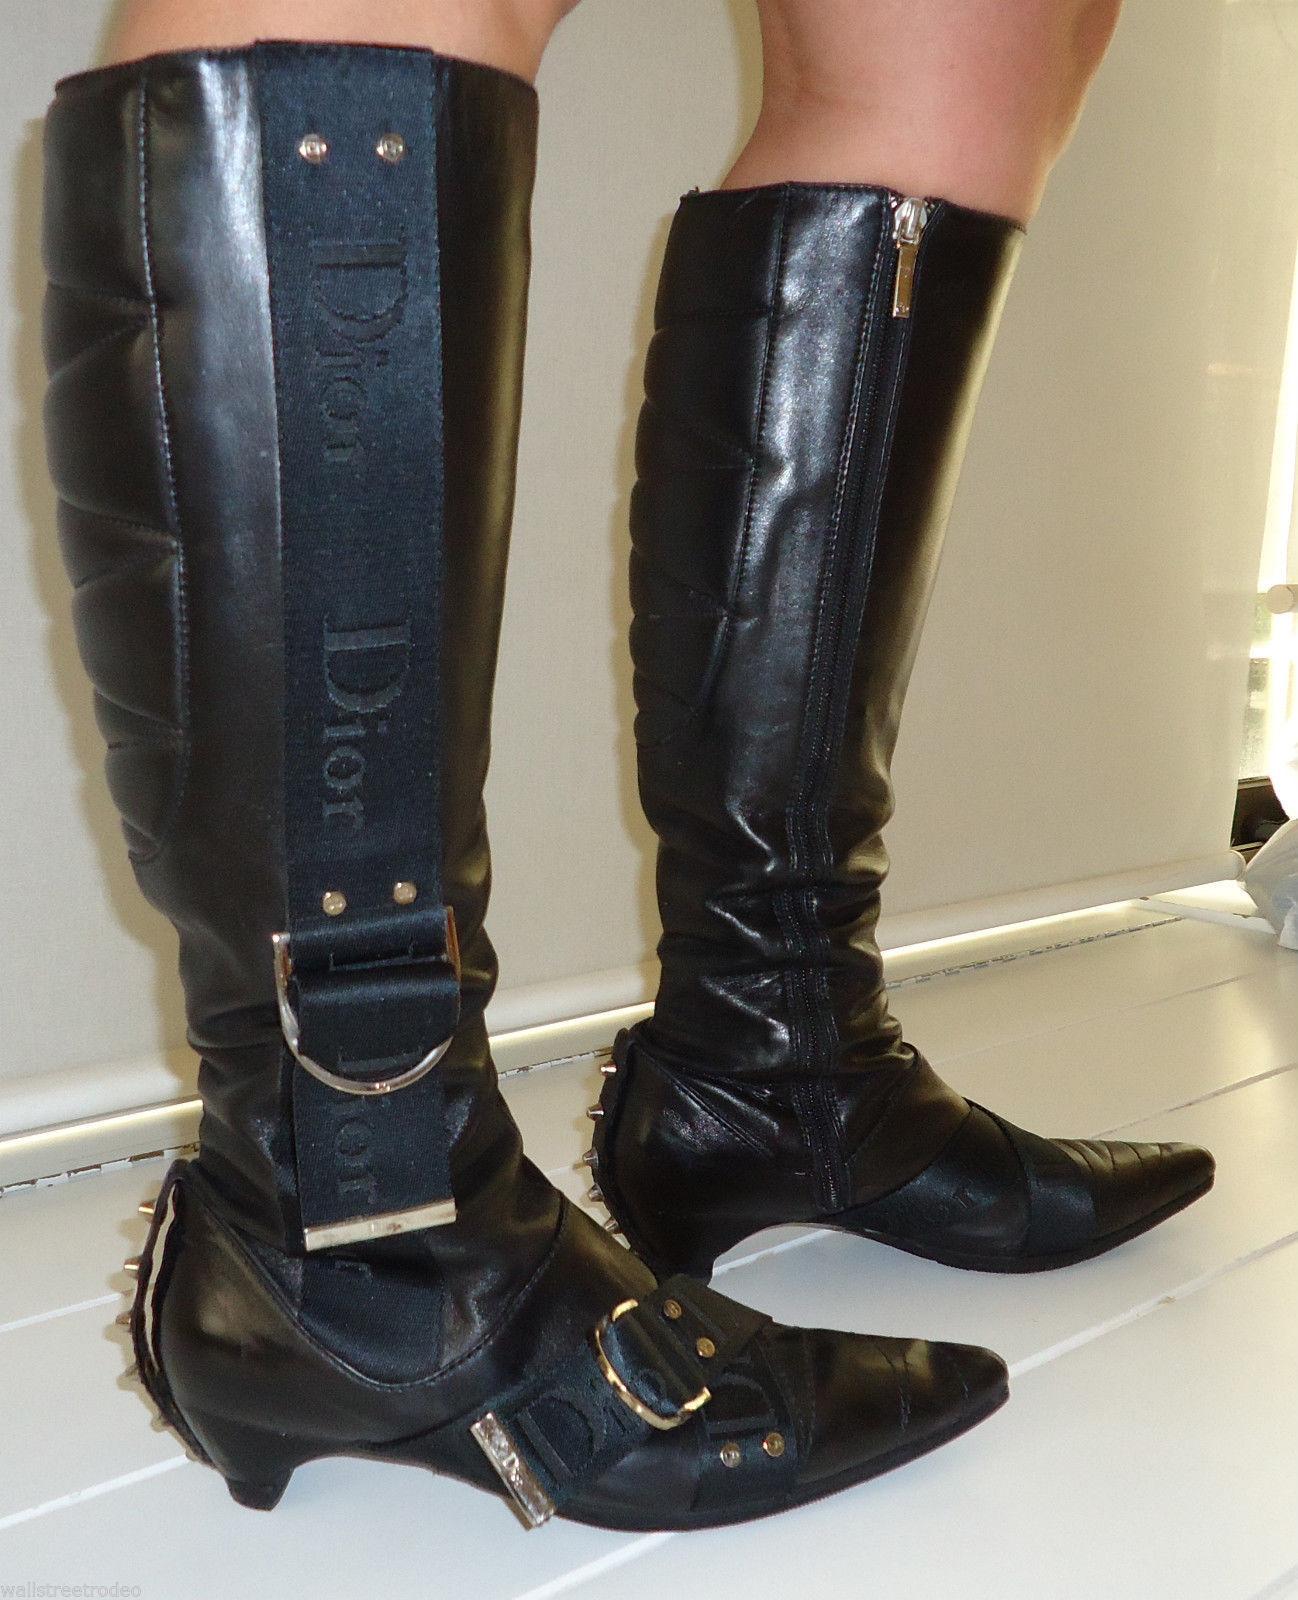 Dior biker logo quilted butter leather motorcylce punk runway boots 6 36 UK3.5